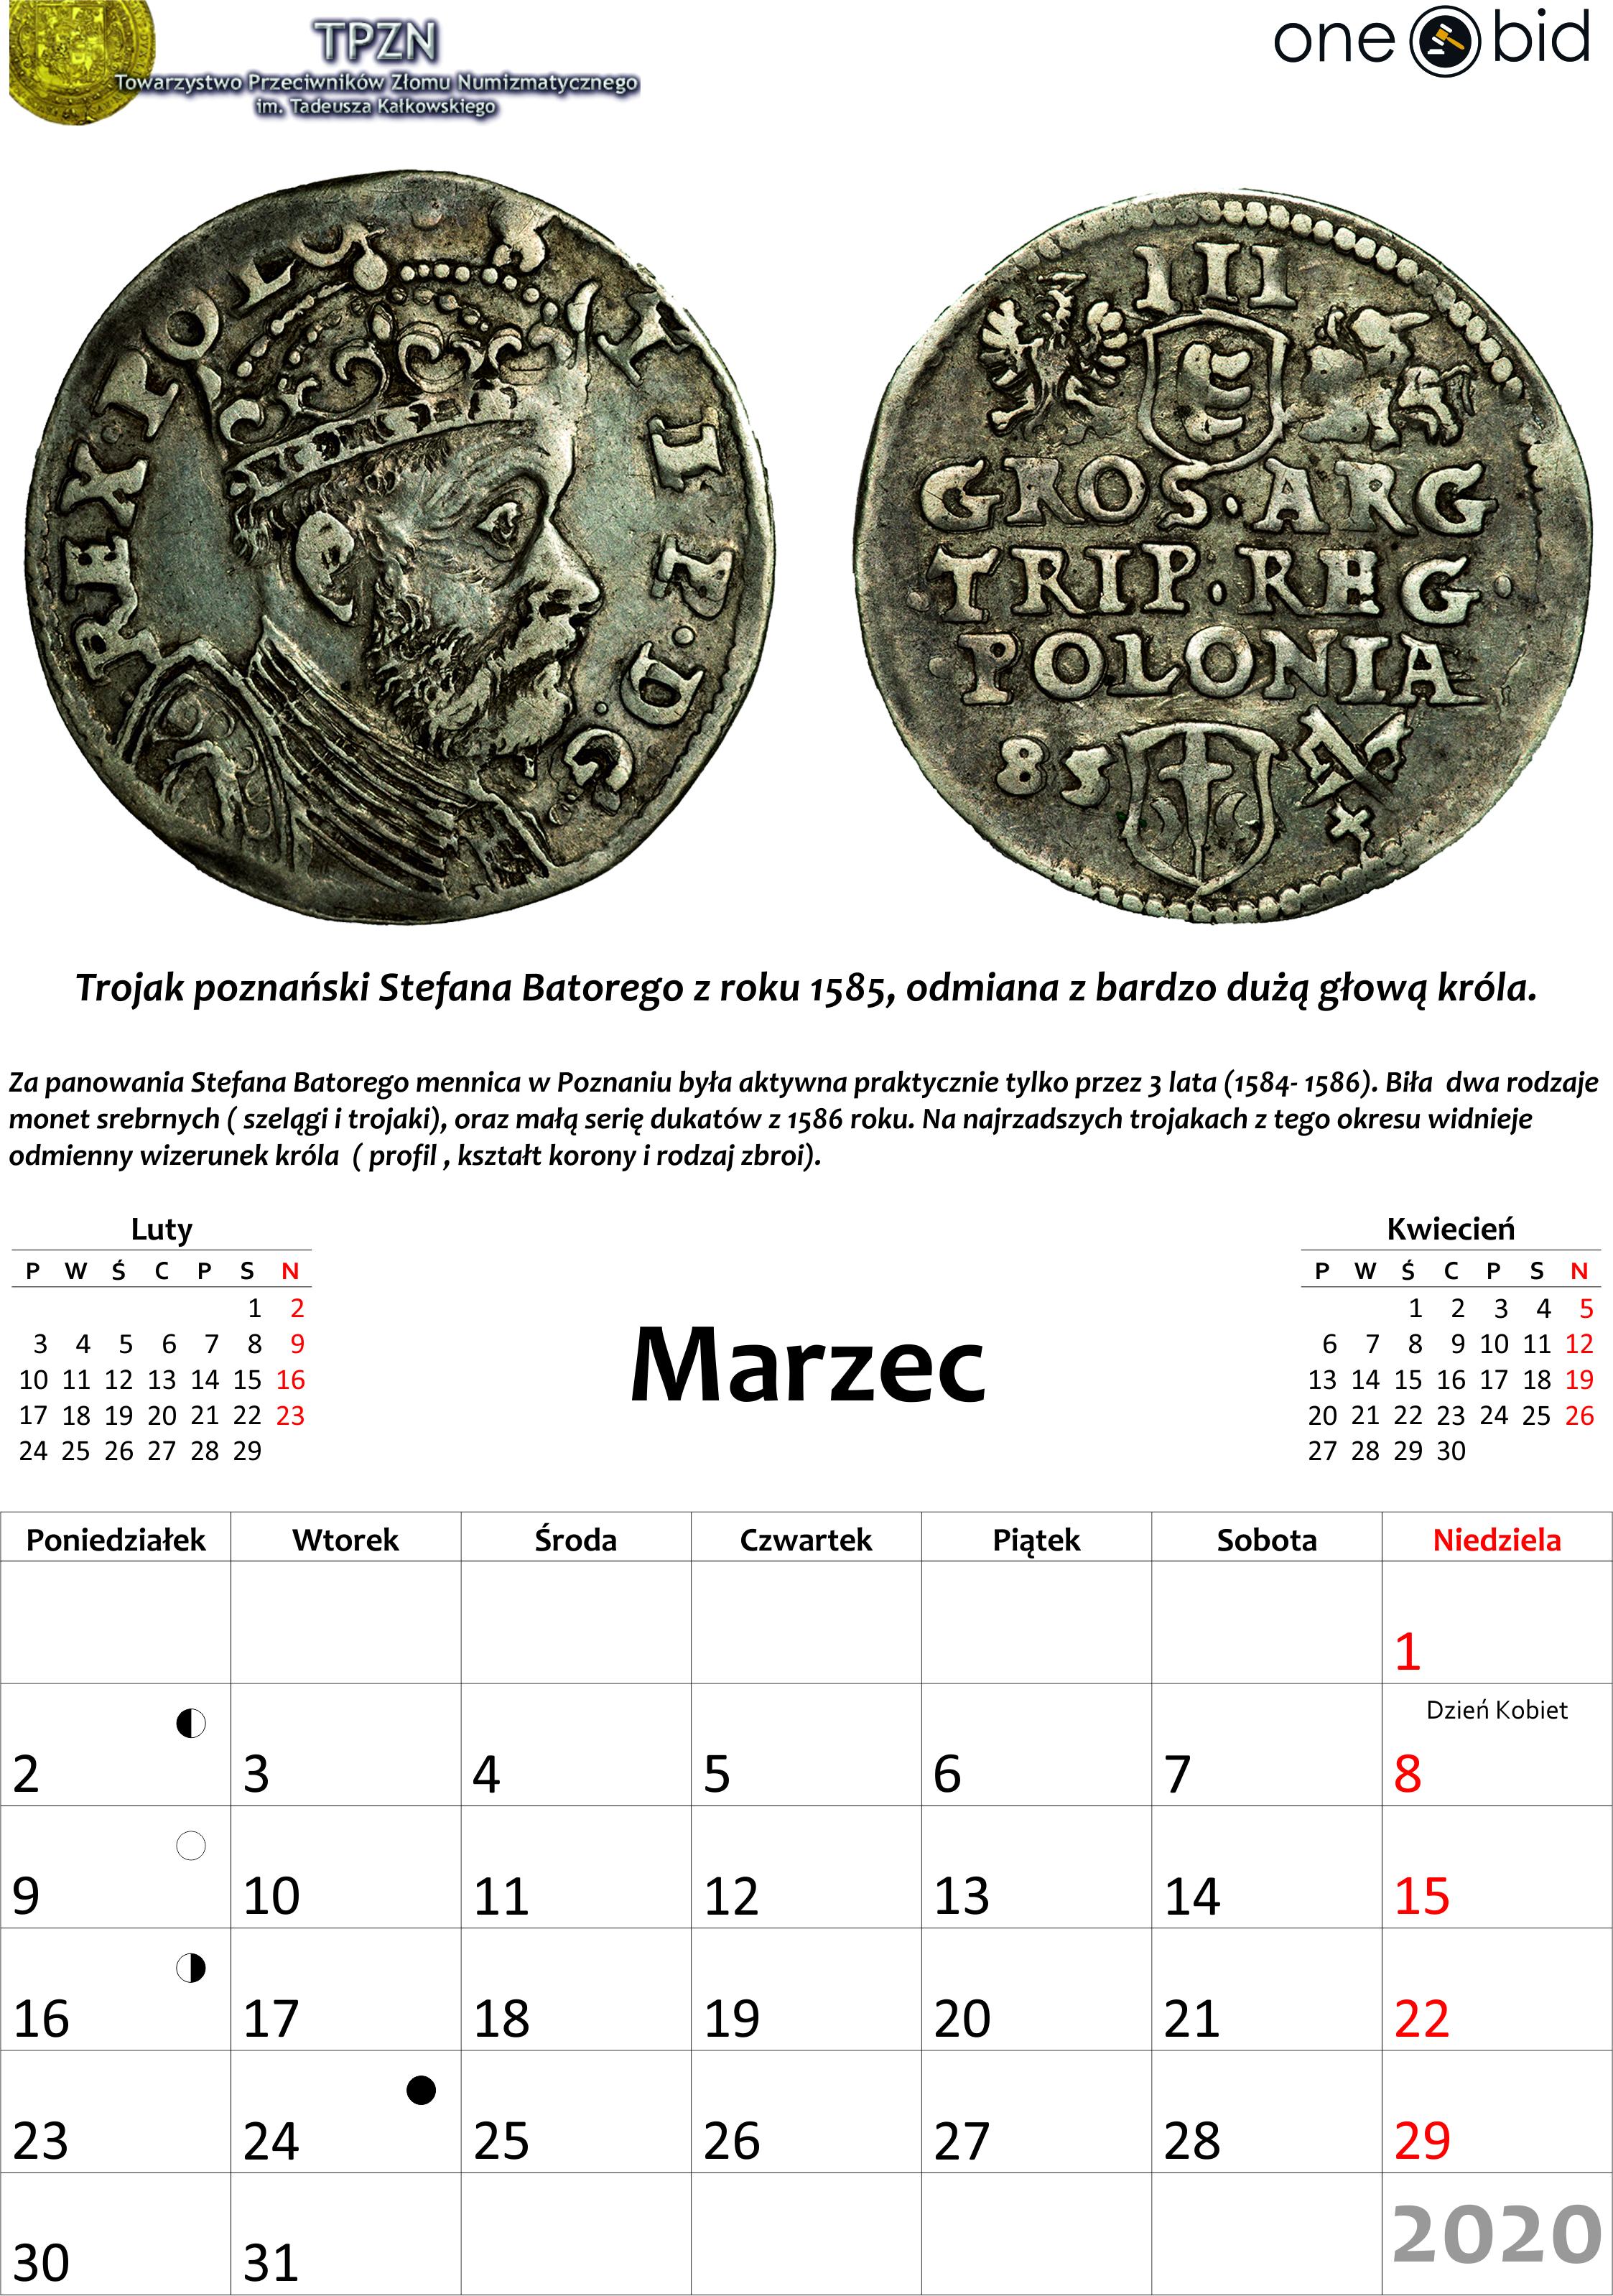 http://info.tpzn.pl/kalendarze/kalendarz2020/marzec.jpg